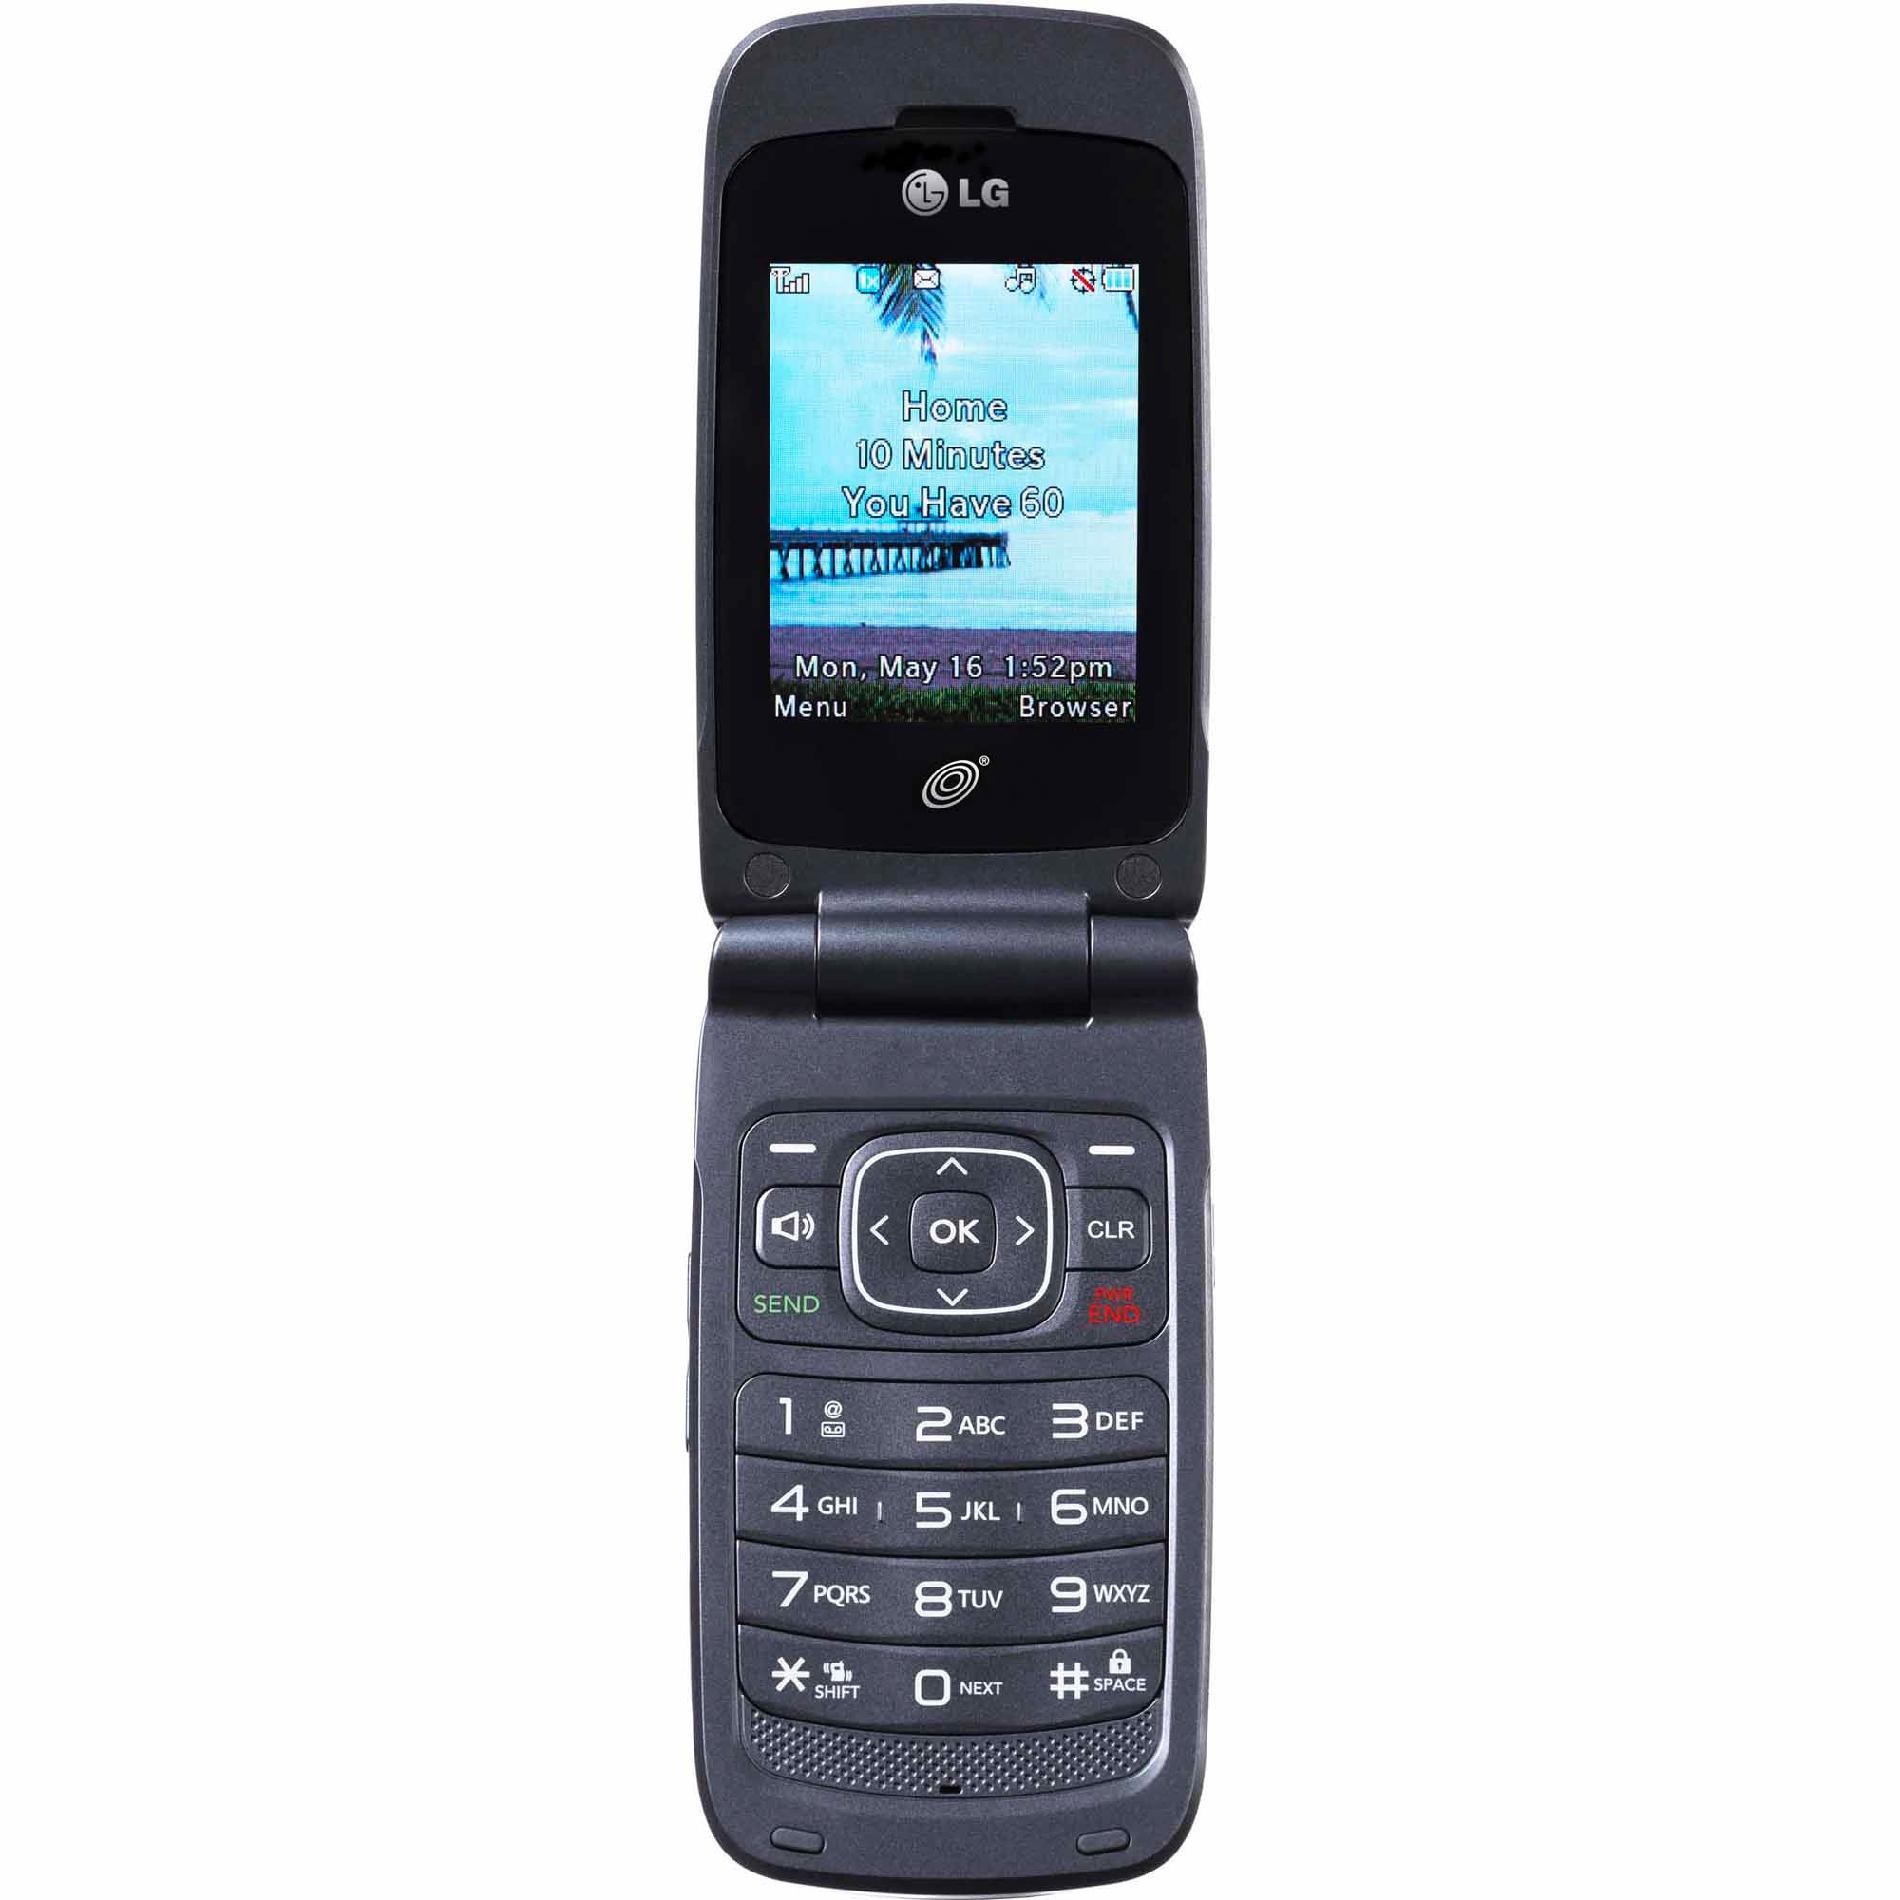 Net10 Lg 221c Cdma Pre-paid Mobile Phone - Tvs & Electronics Cell Phones